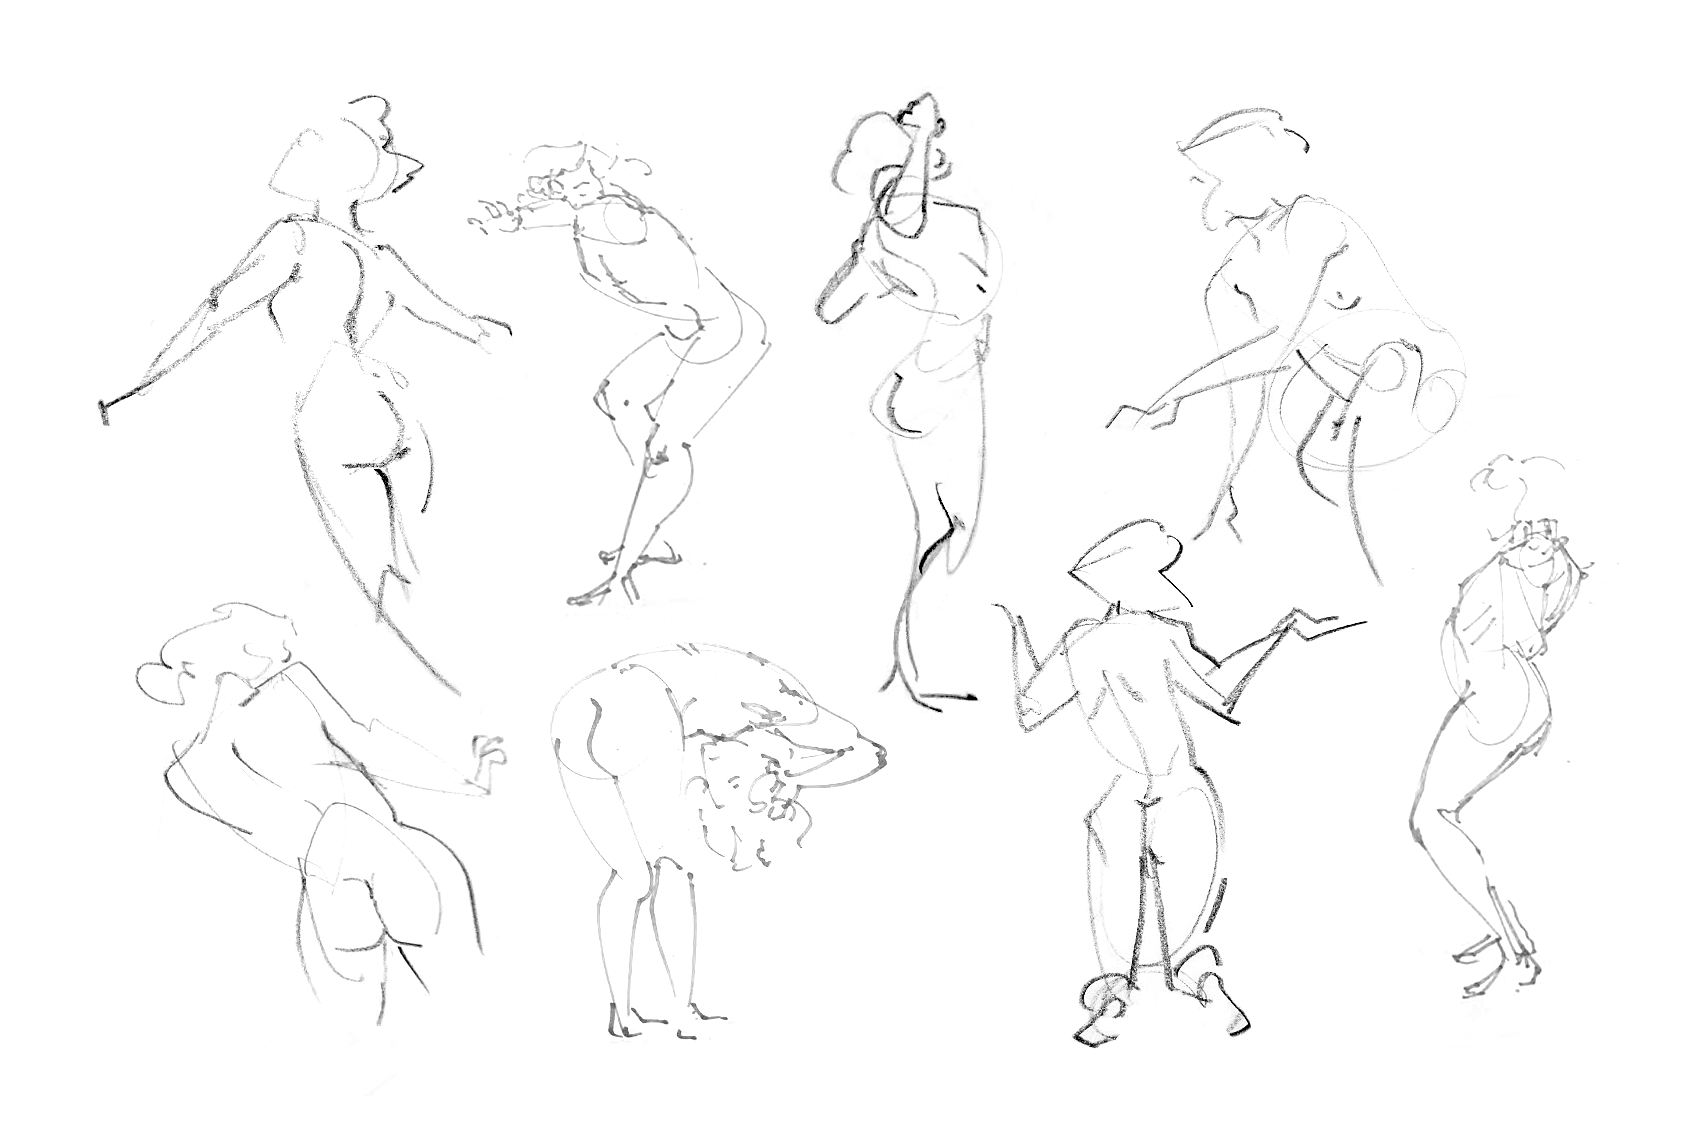 gestures_01-27-19.png